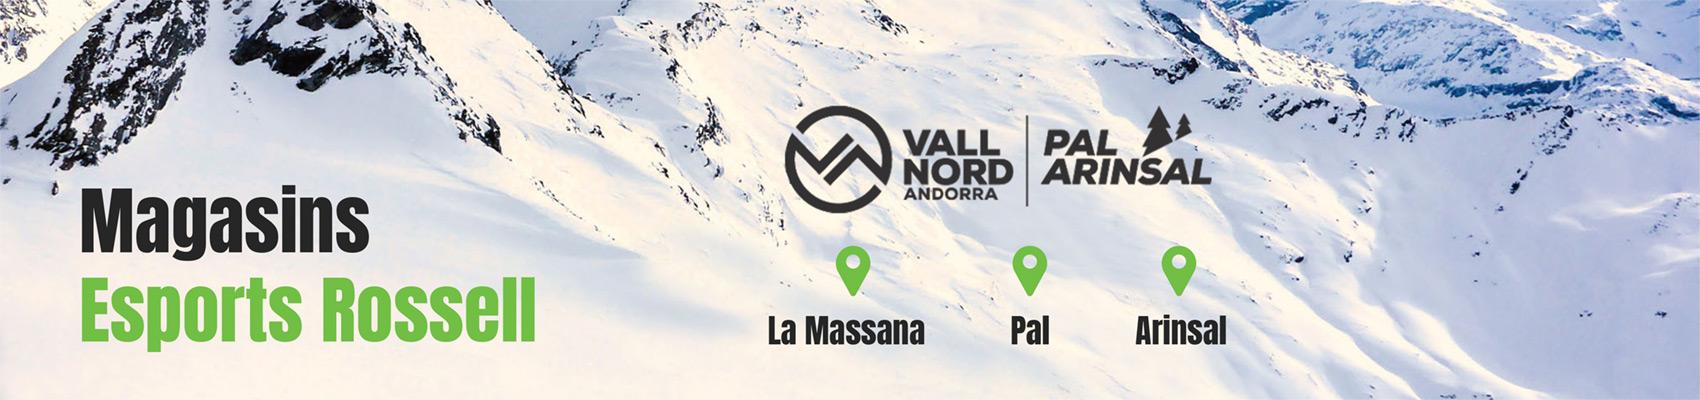 magasins esports rossell ski vallnord andorra